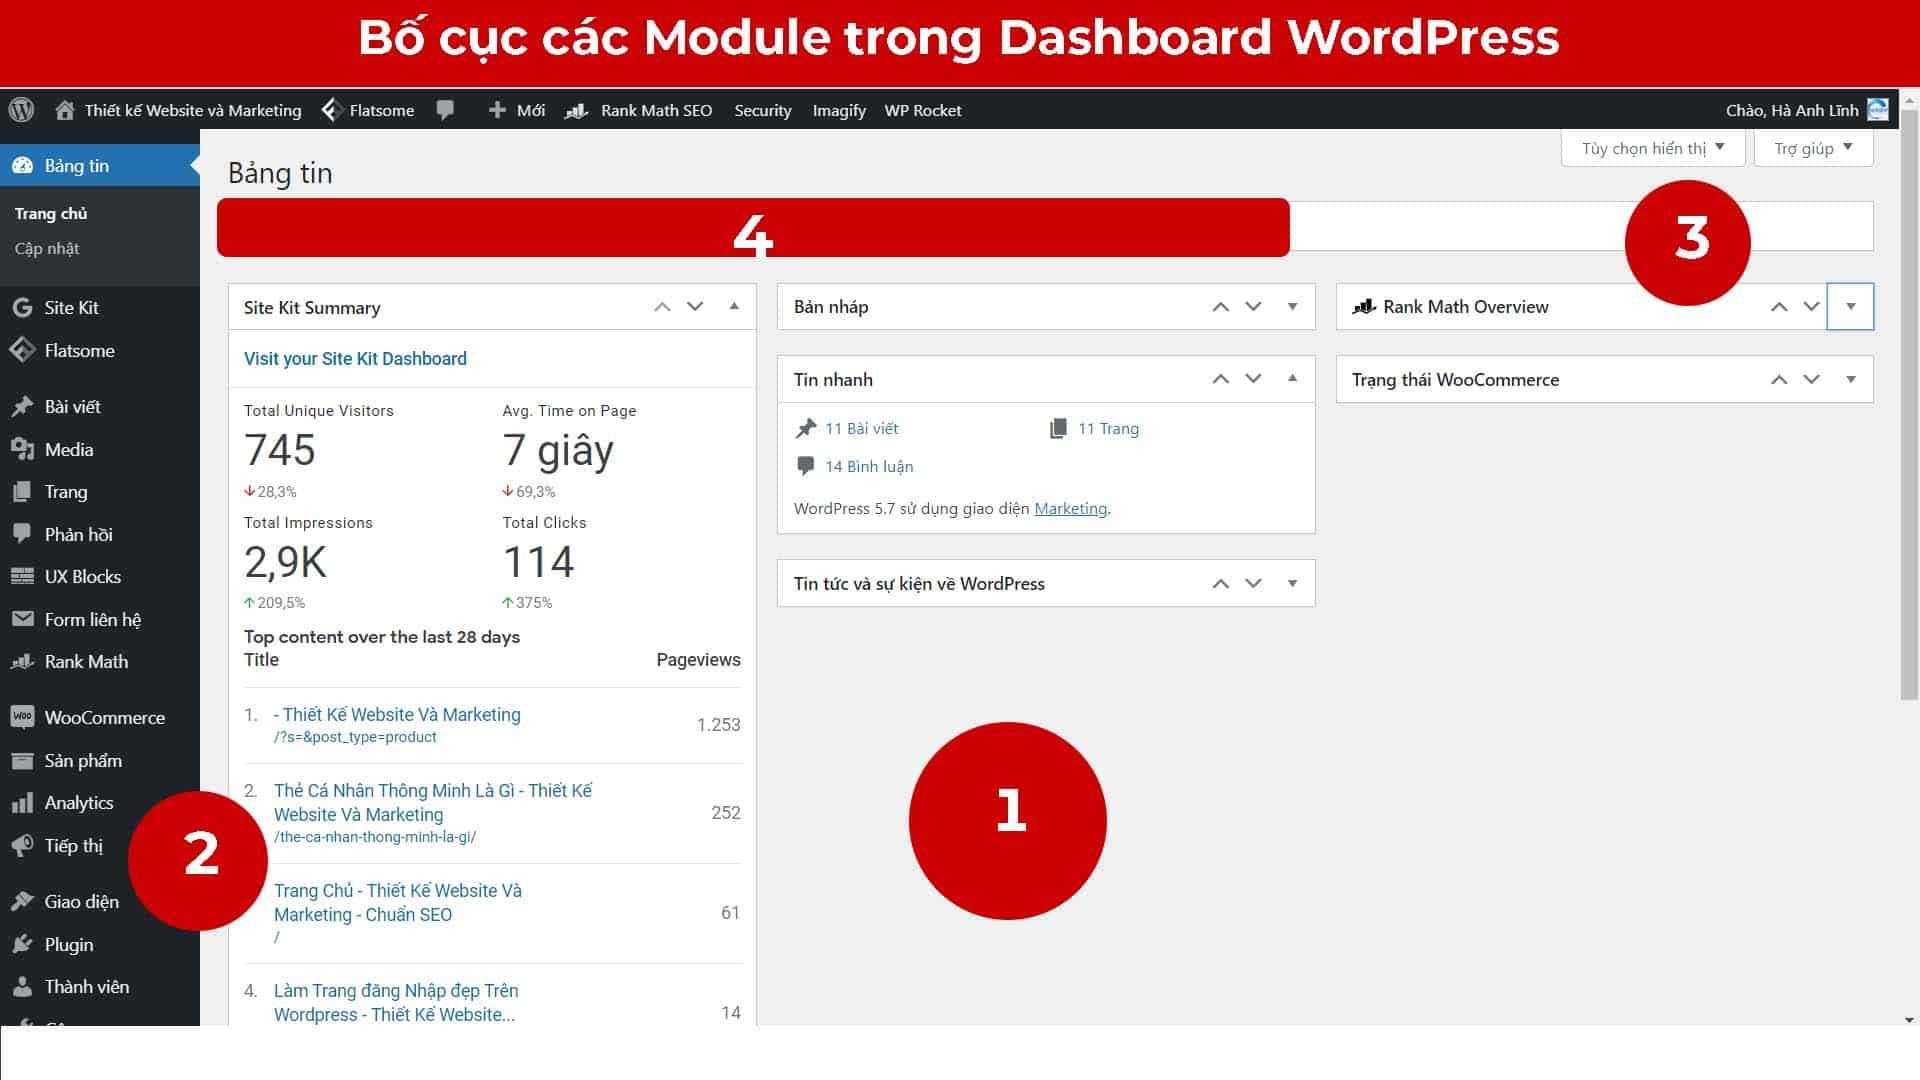 Bố cục Dashboard WordPress